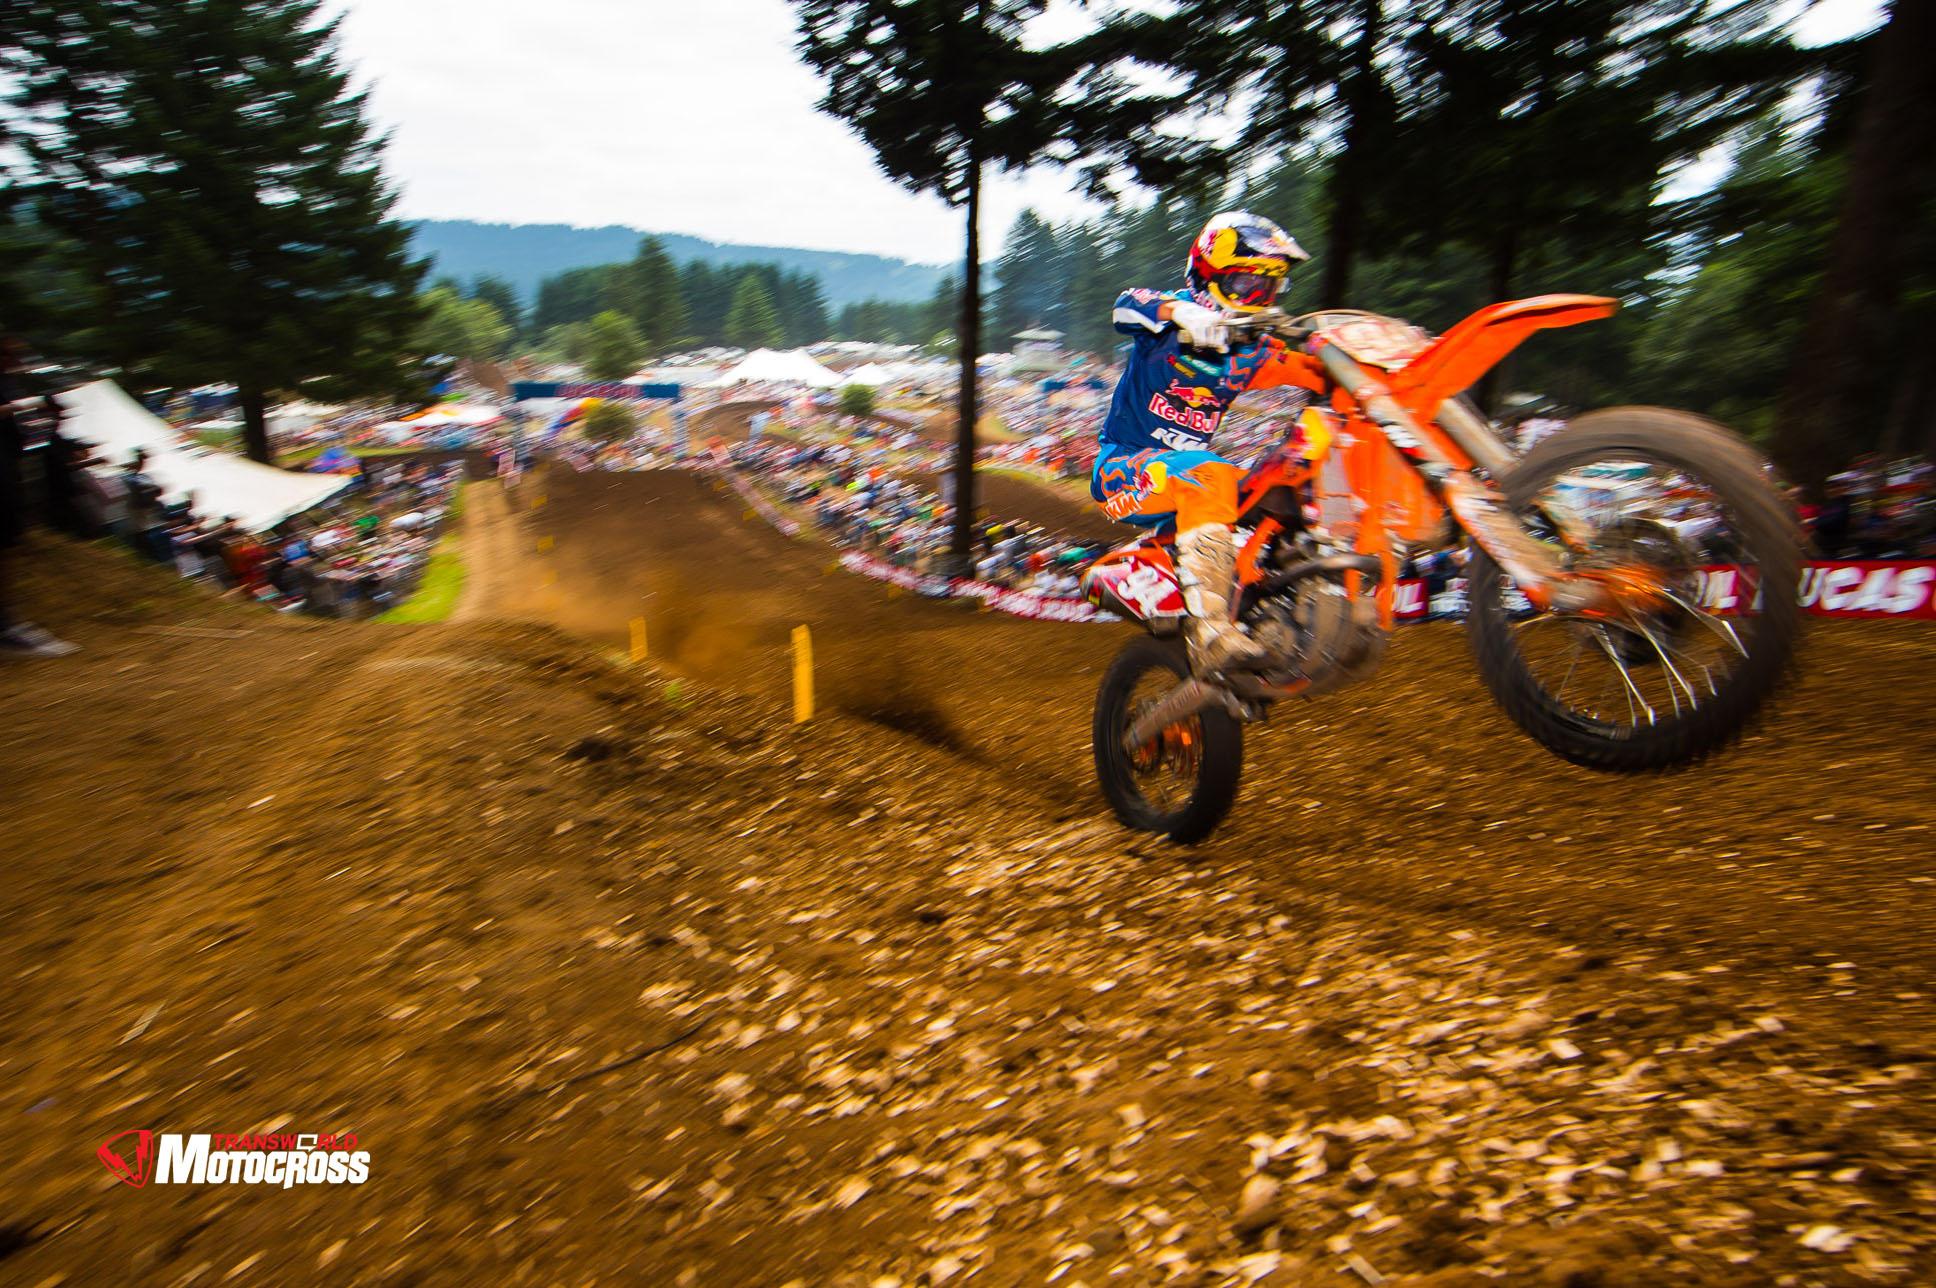 Hd Wallpapers Transworld Motocross Girls 1900 X 1267 399 Kb Jpeg HD 1936x1288